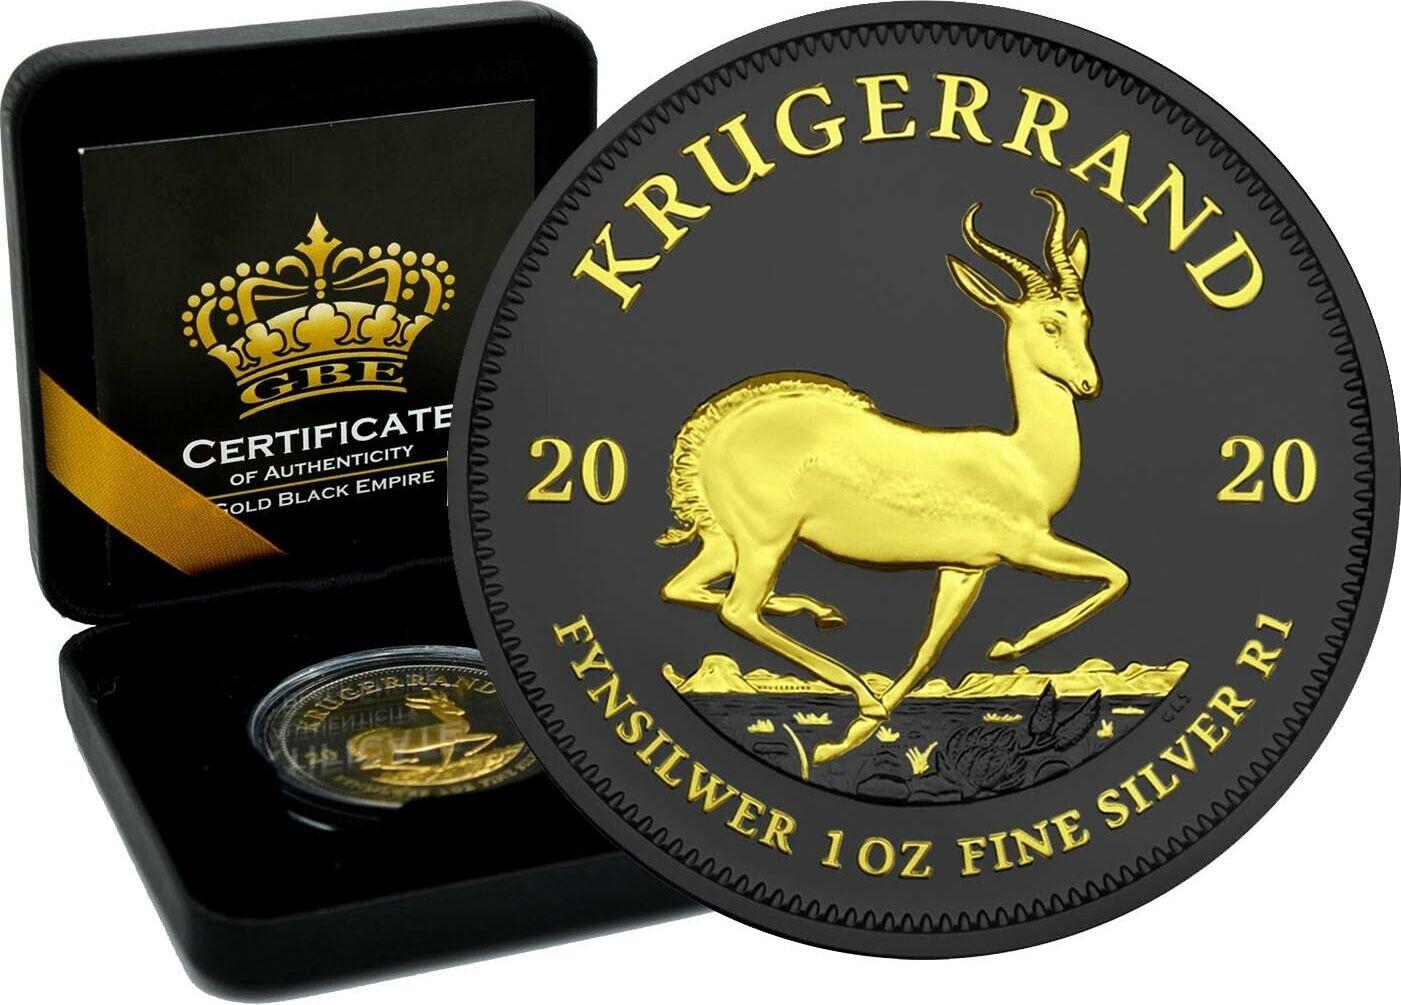 1 Rand 2020 Südafrika 1oz Silbermünze Krügerrand Ruthenium und Gilded Black Empire Stempelglanz Rutheniu Gilded